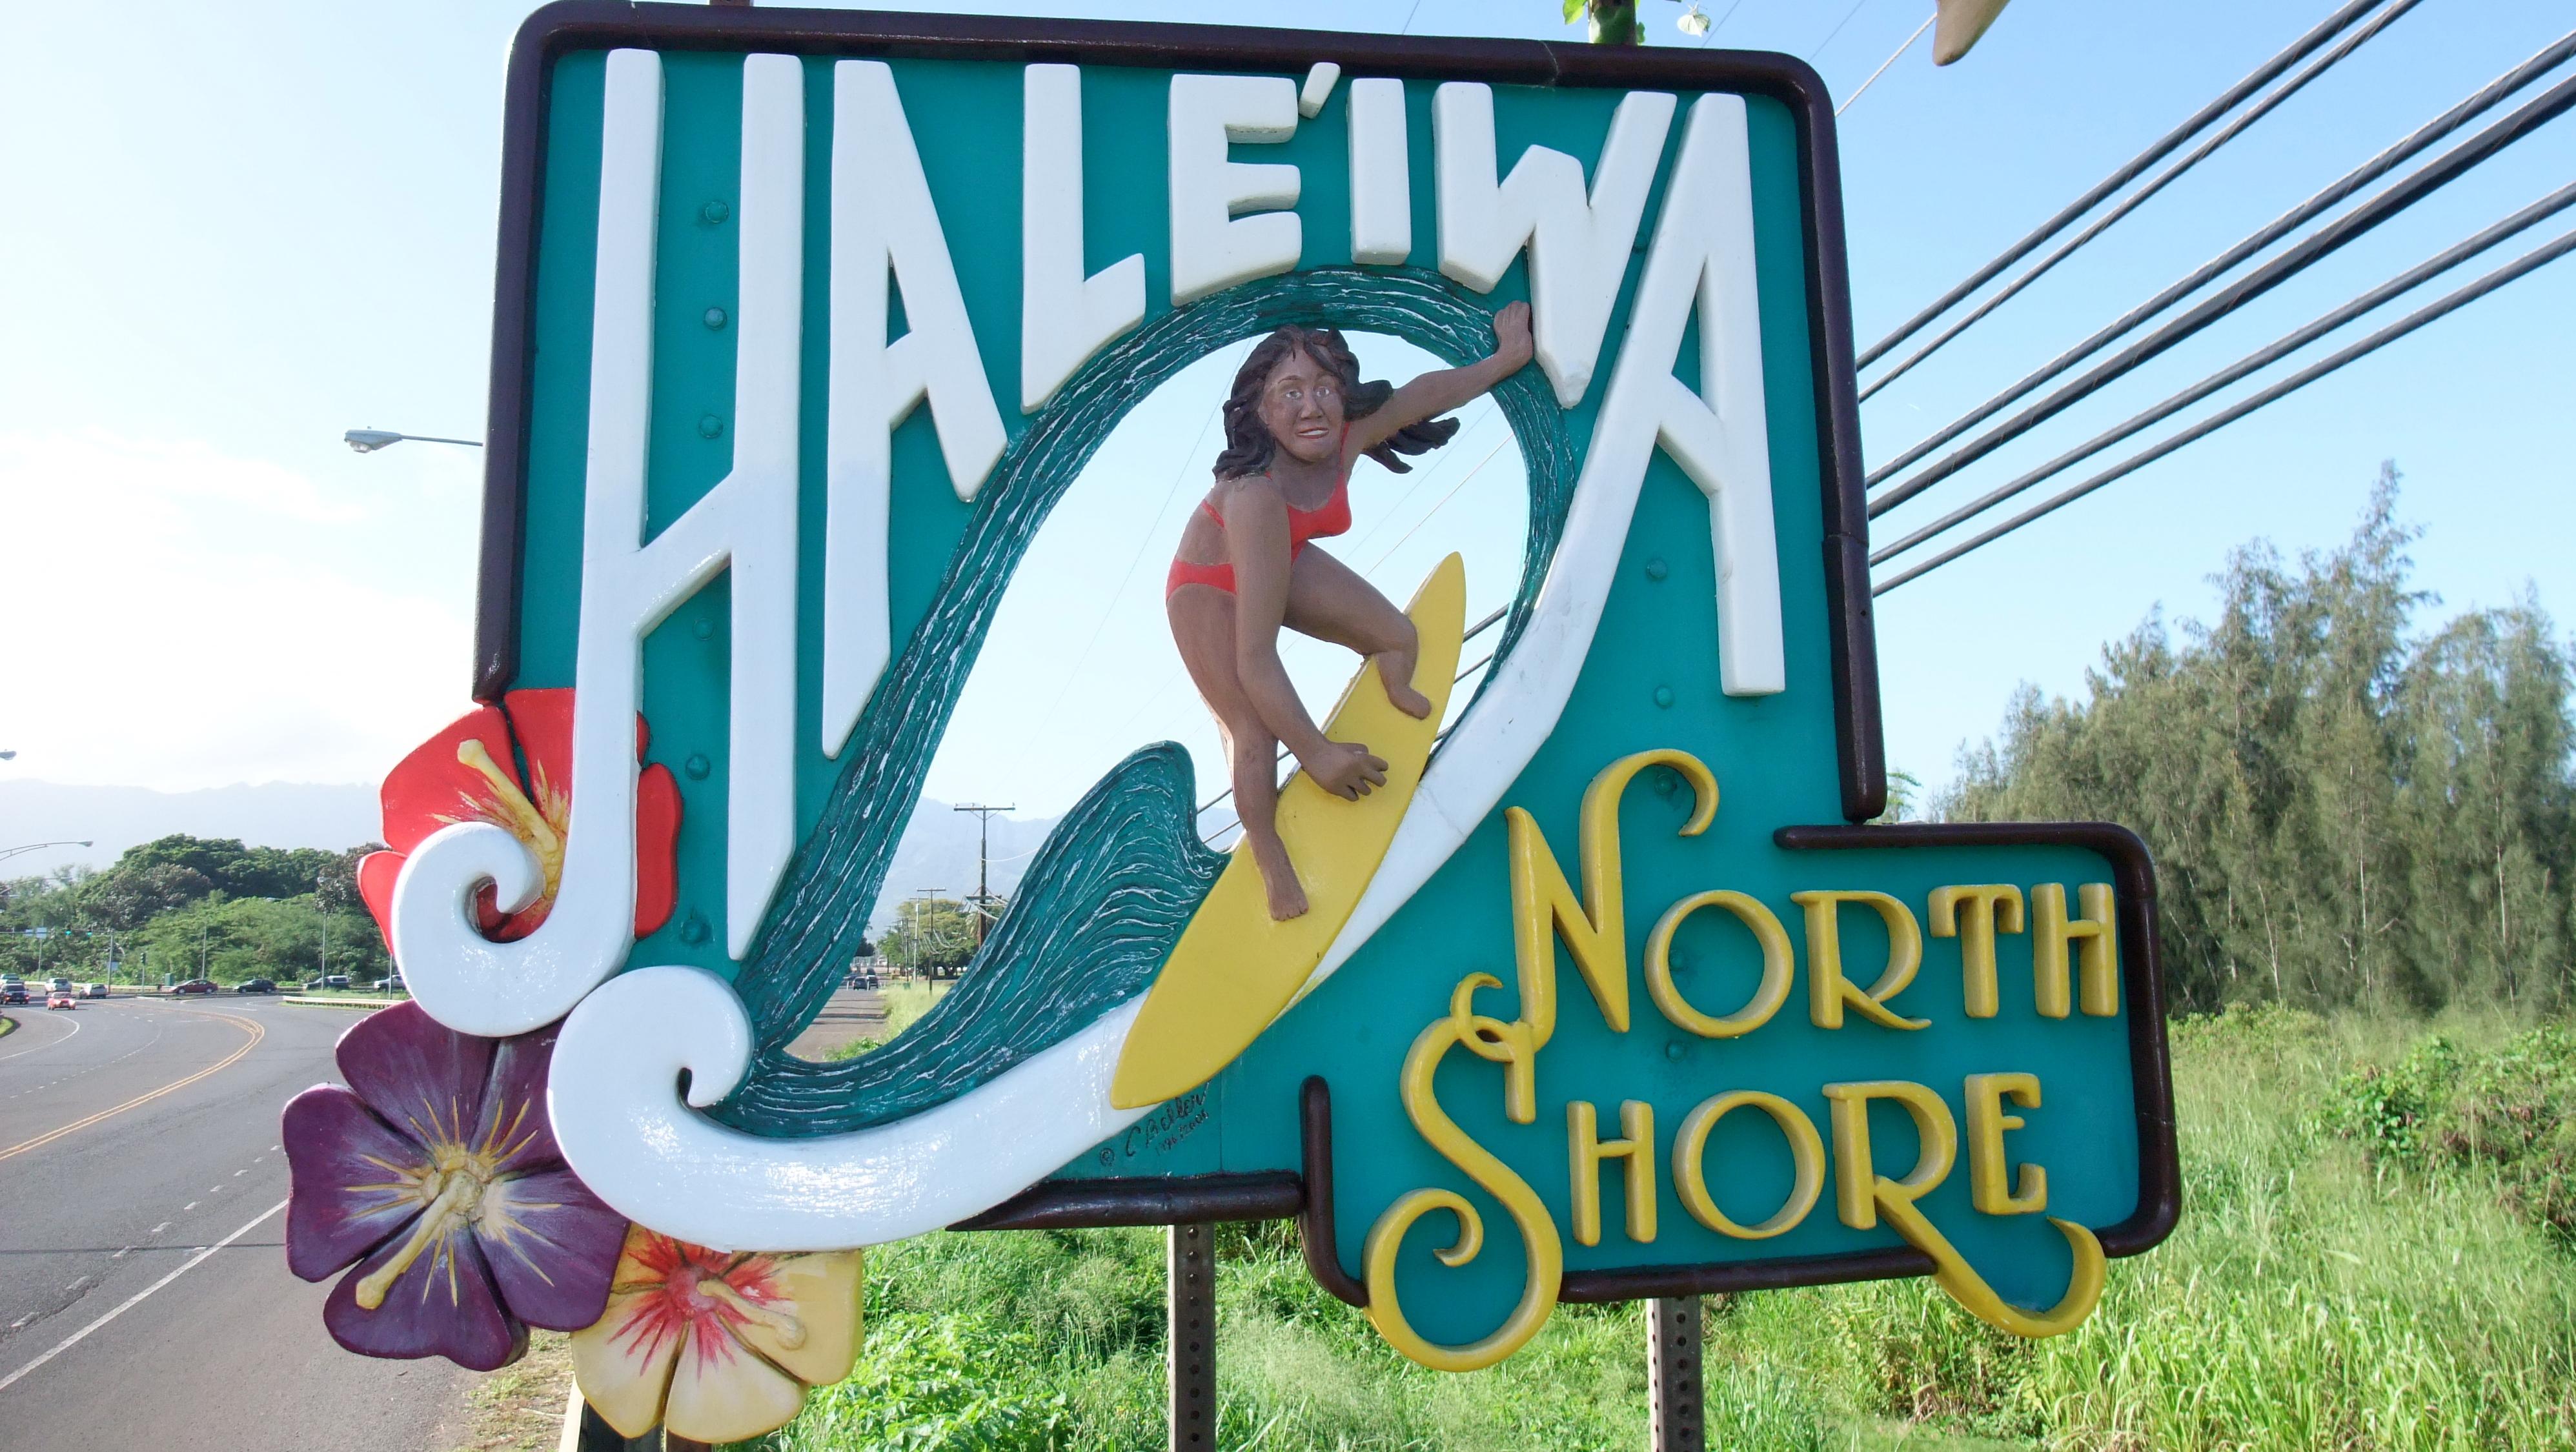 Haleiwa entry